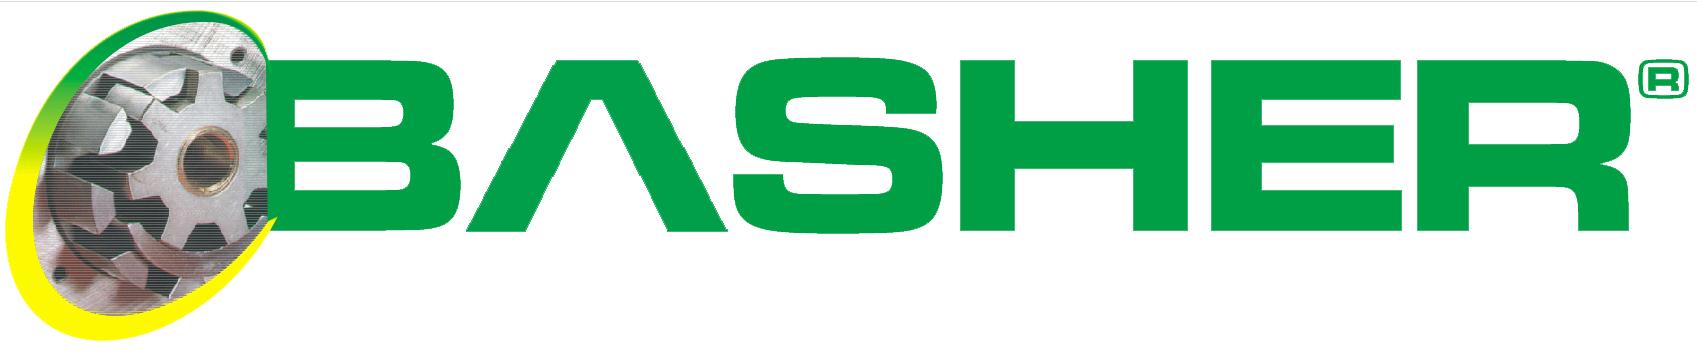 Basher Pump Manufacturing industrial Equipments Pressure Technologies int Trade Co Ltd, Basher Pump